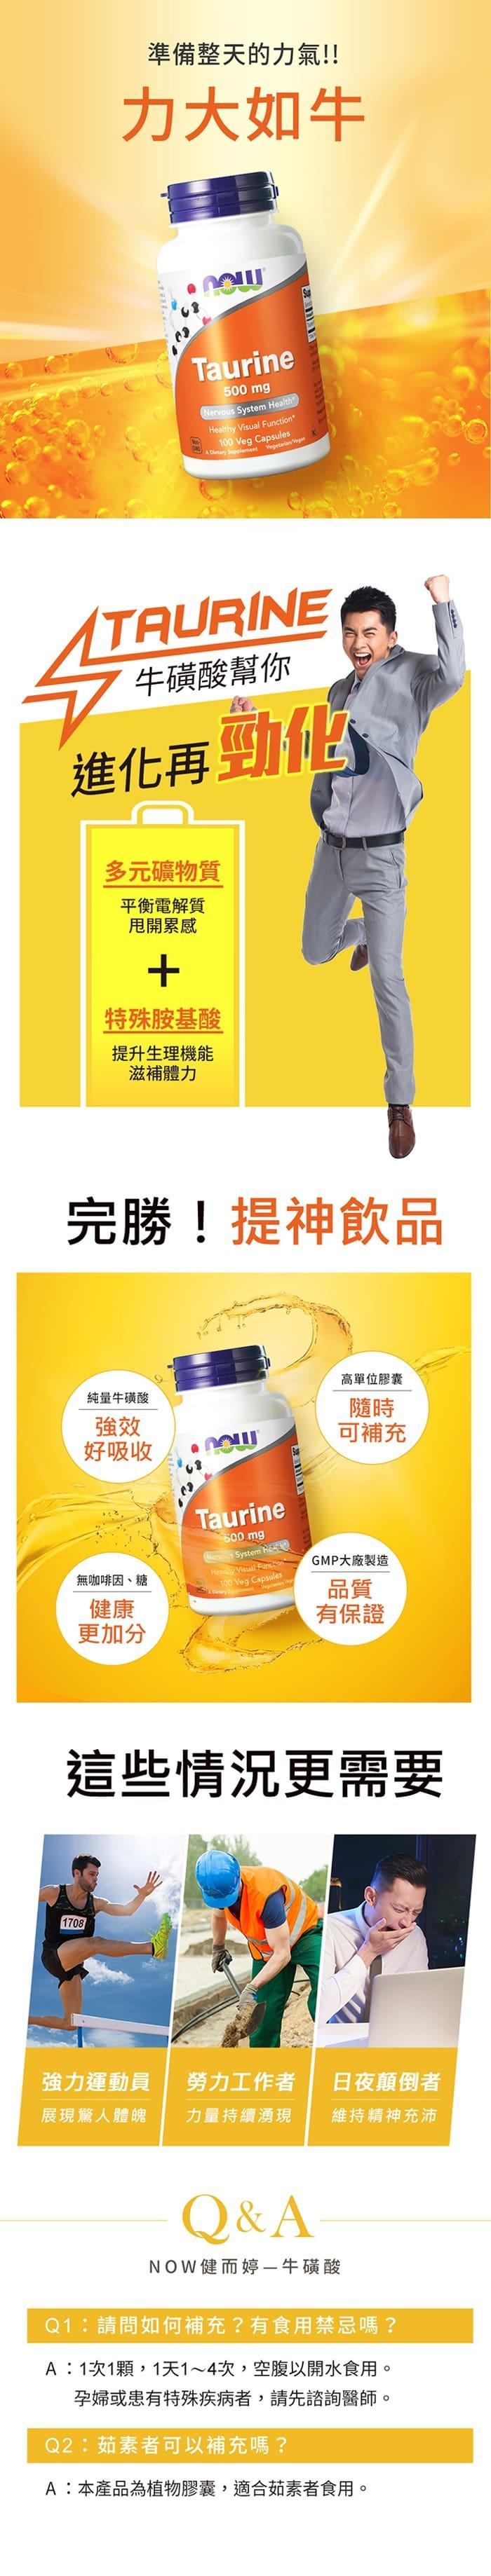 NOW健而婷-牛磺酸(100顆)產品資訊